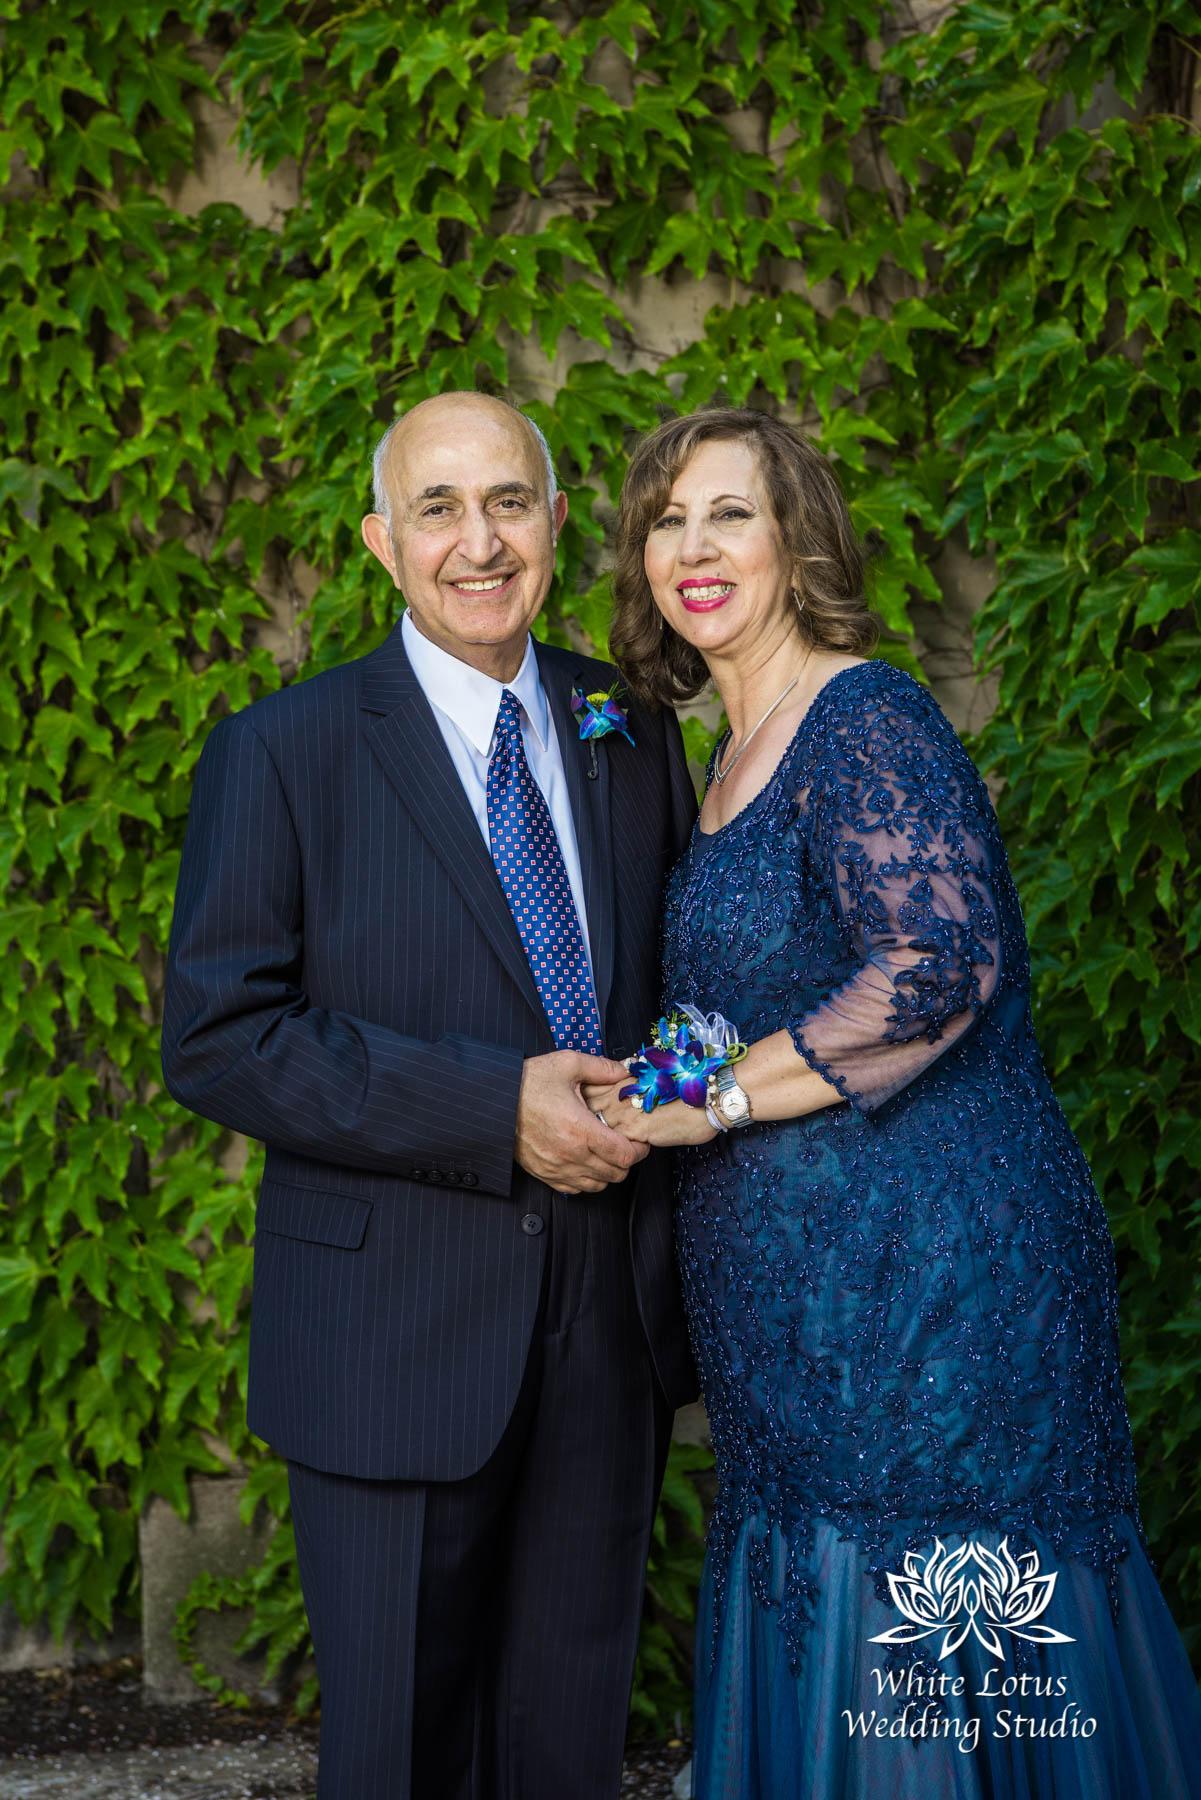 172 - Wedding - Toronto - Liberty Grand - Bride and Groom - PW